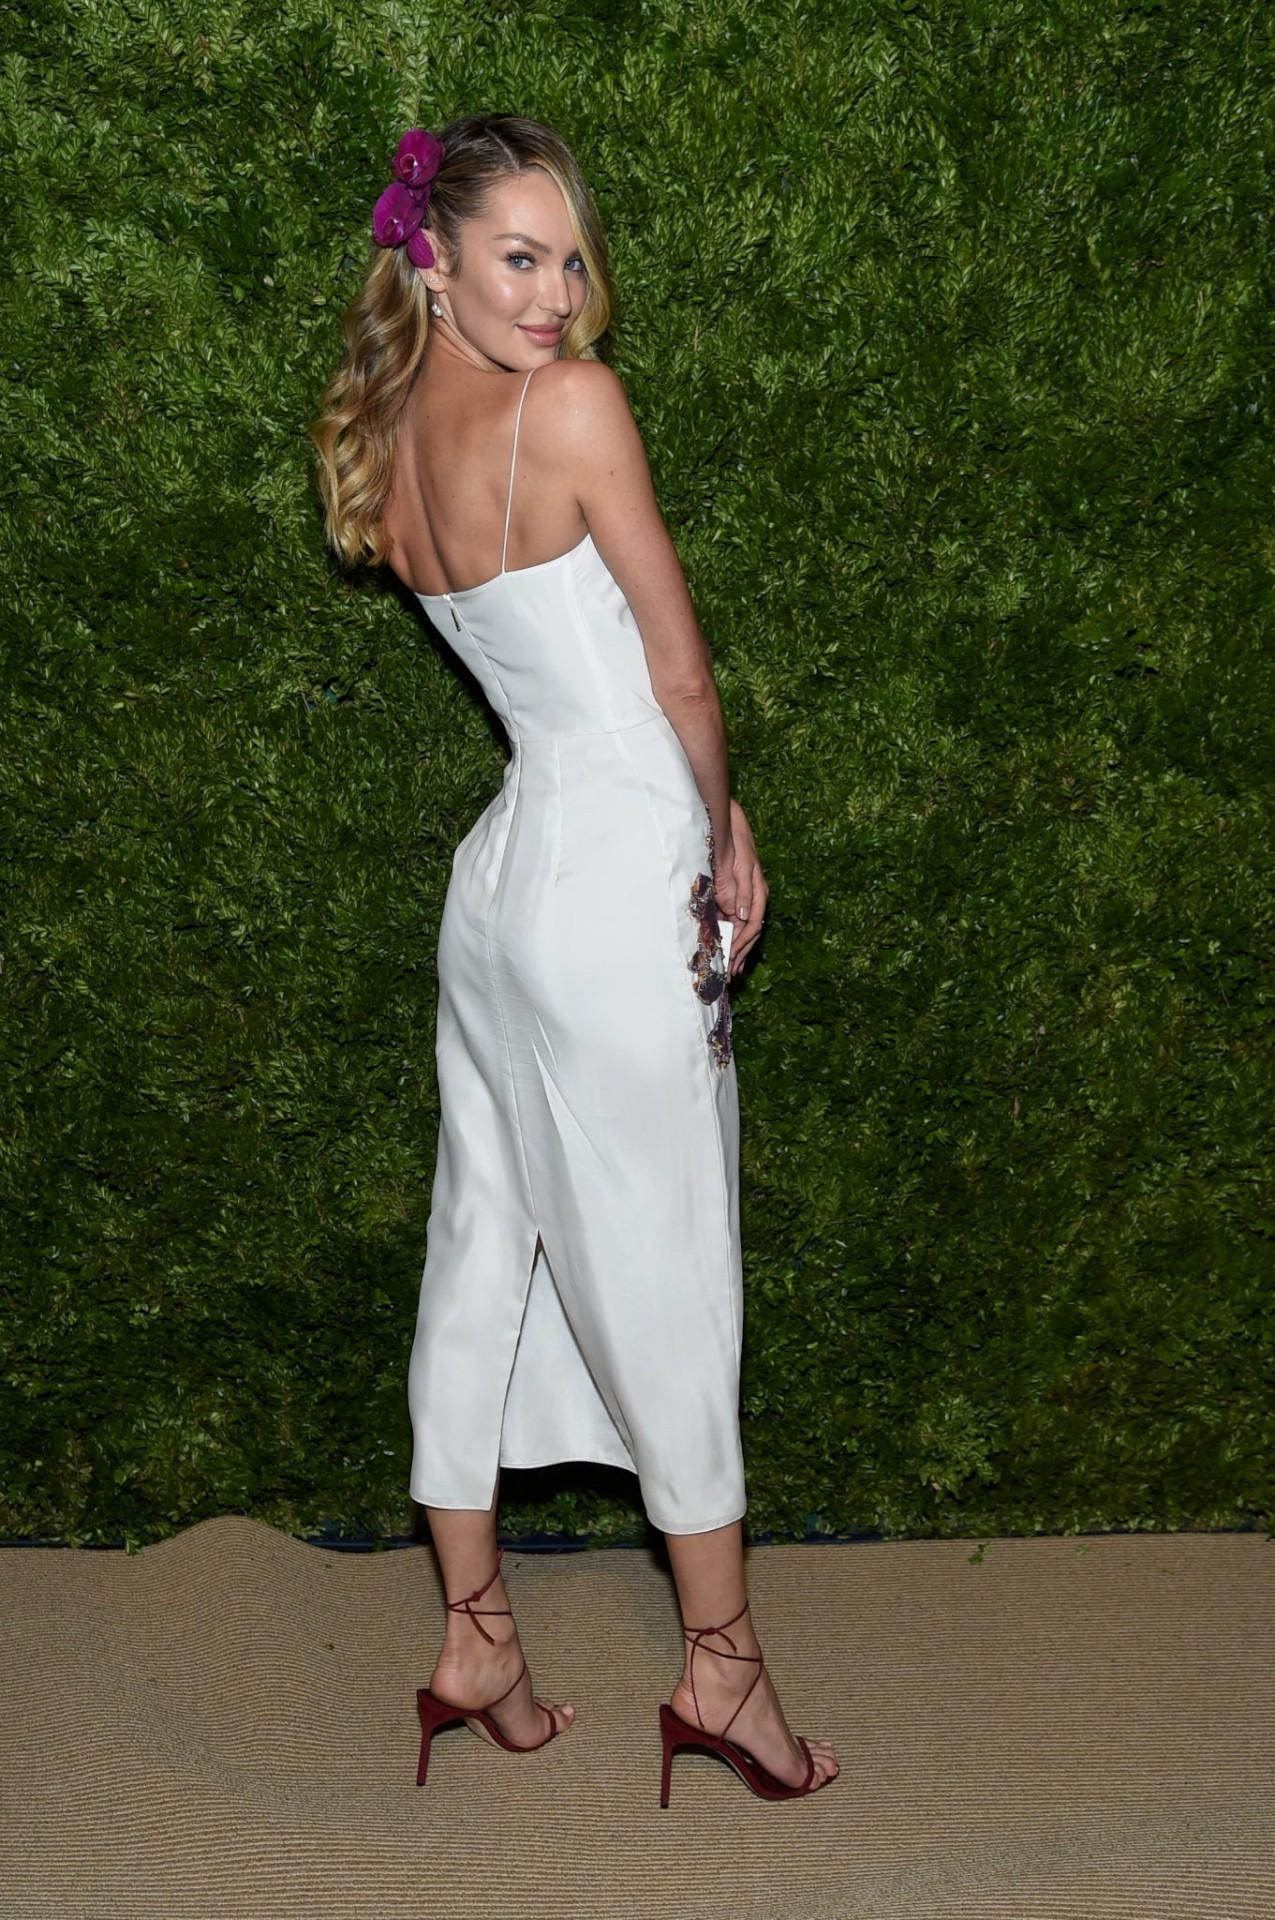 Candice Swanepoel Beautiful White Dress